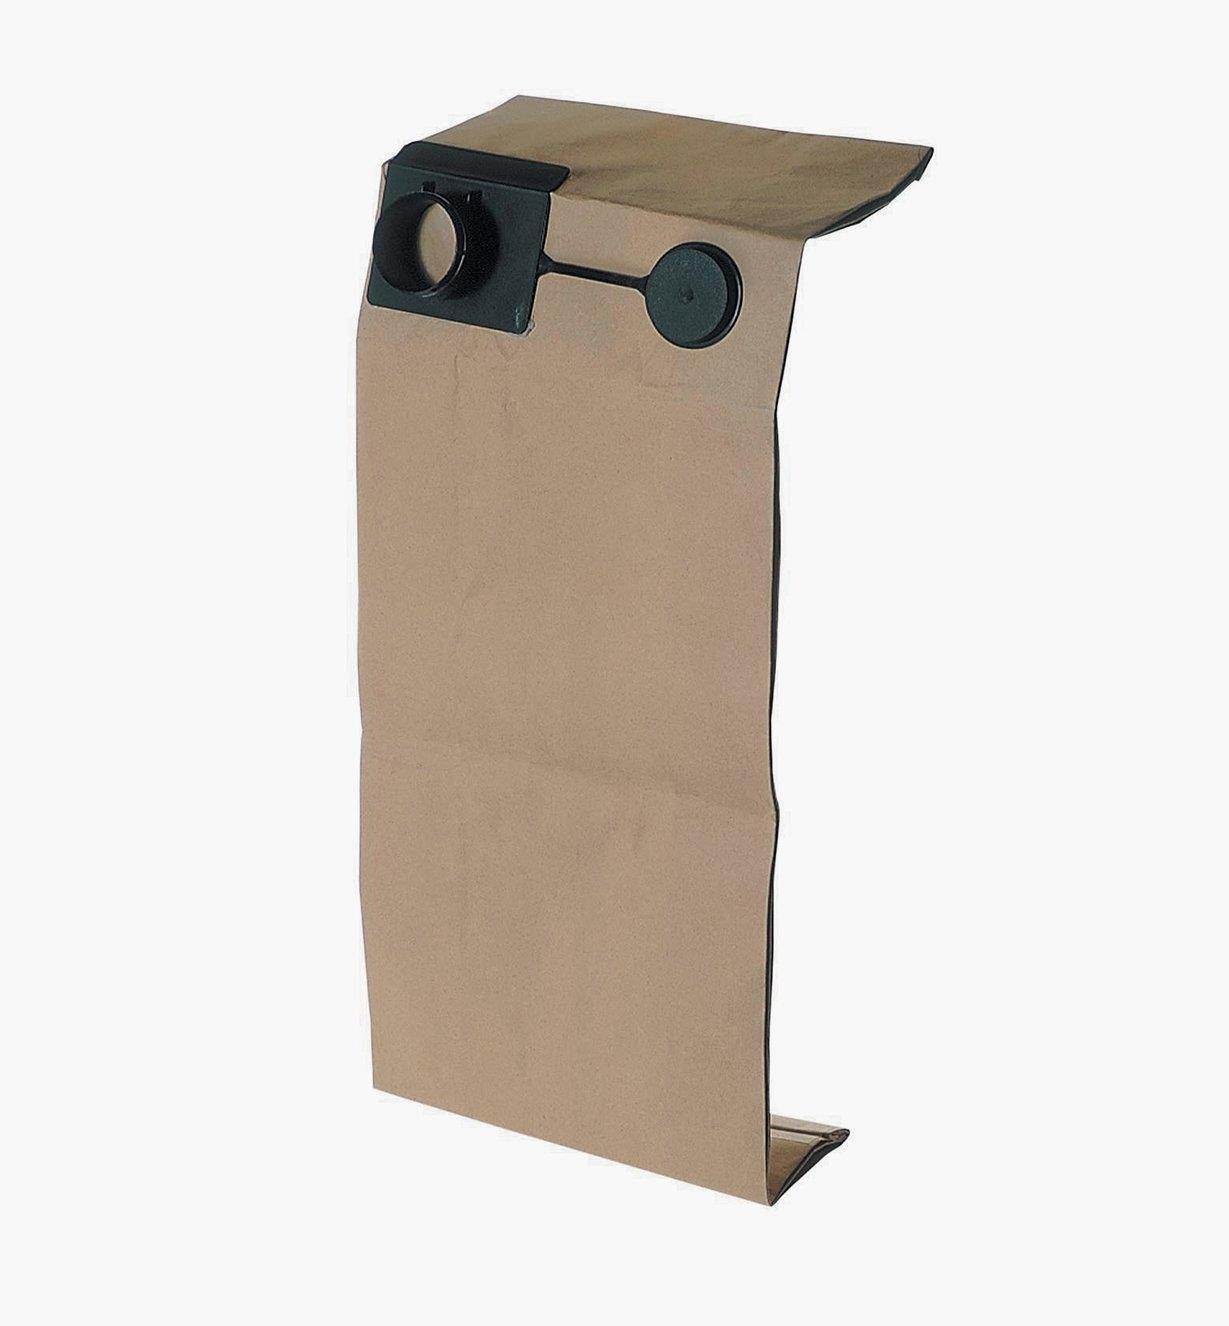 ZA452970 - Filter Bag qty 5 (CT 22 E)